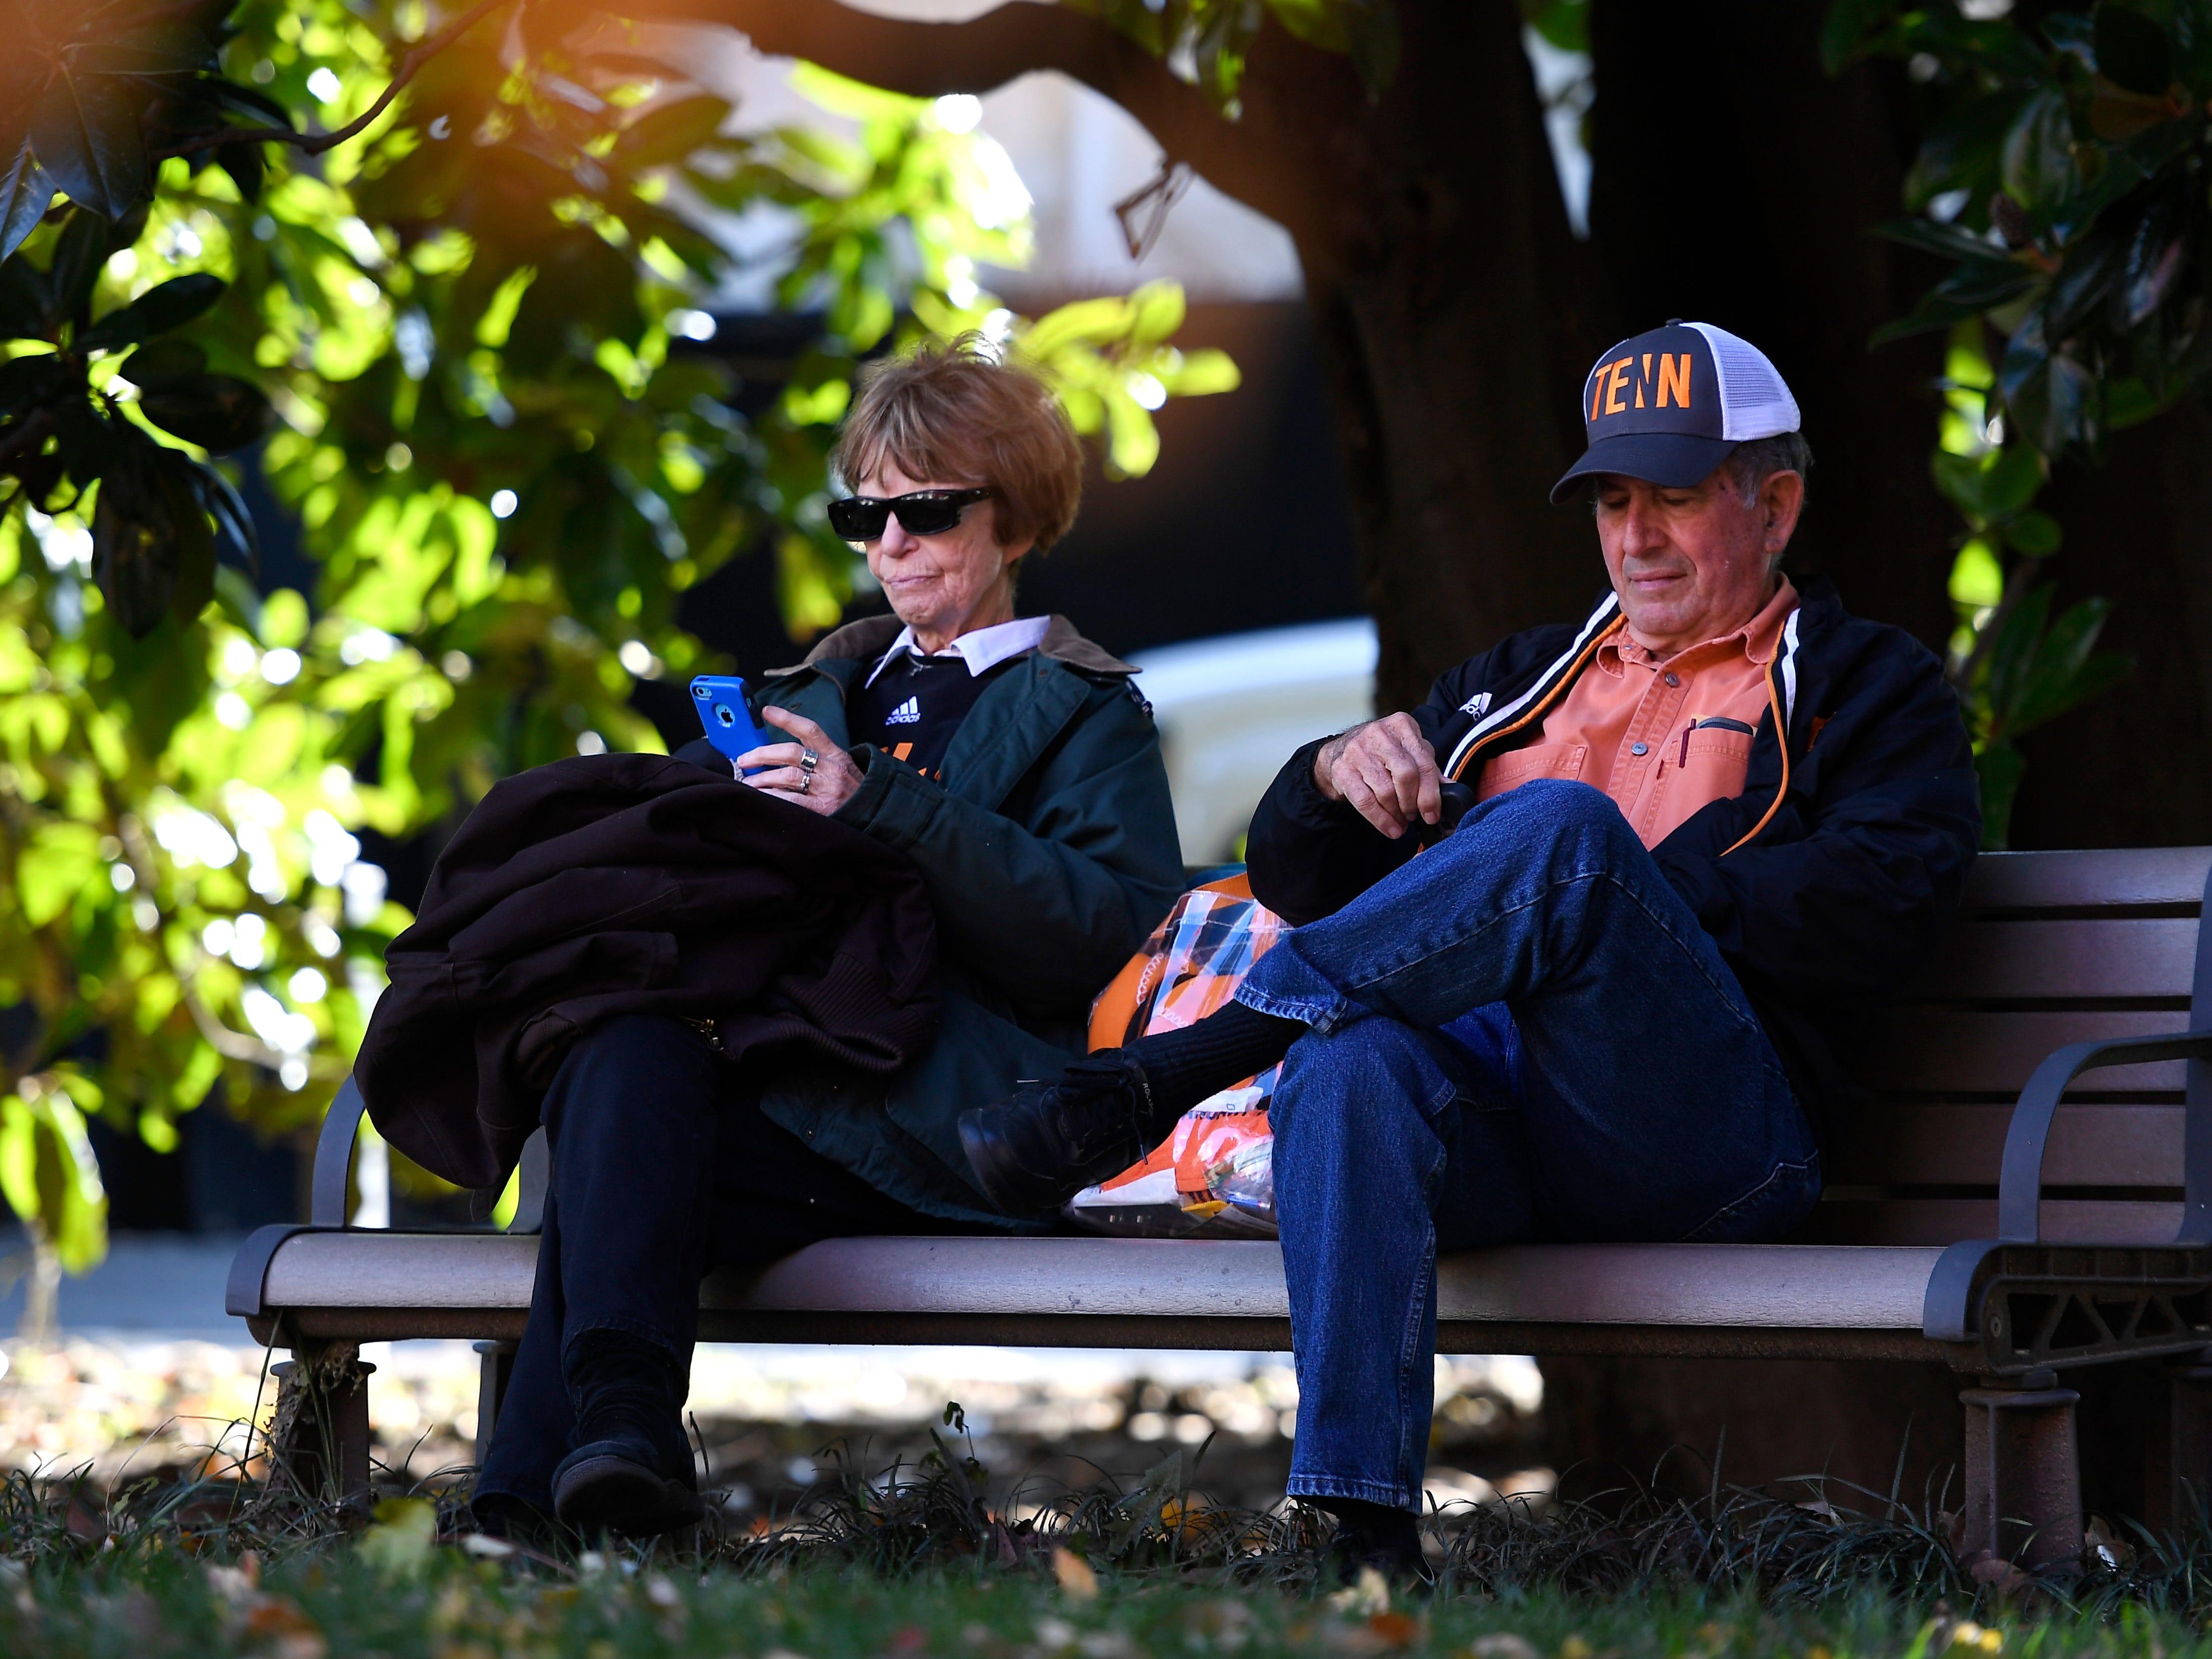 Vols fans take a break before the game at Vanderbilt Stadium Saturday, Nov. 24, 2018, in Nashville, Tenn.